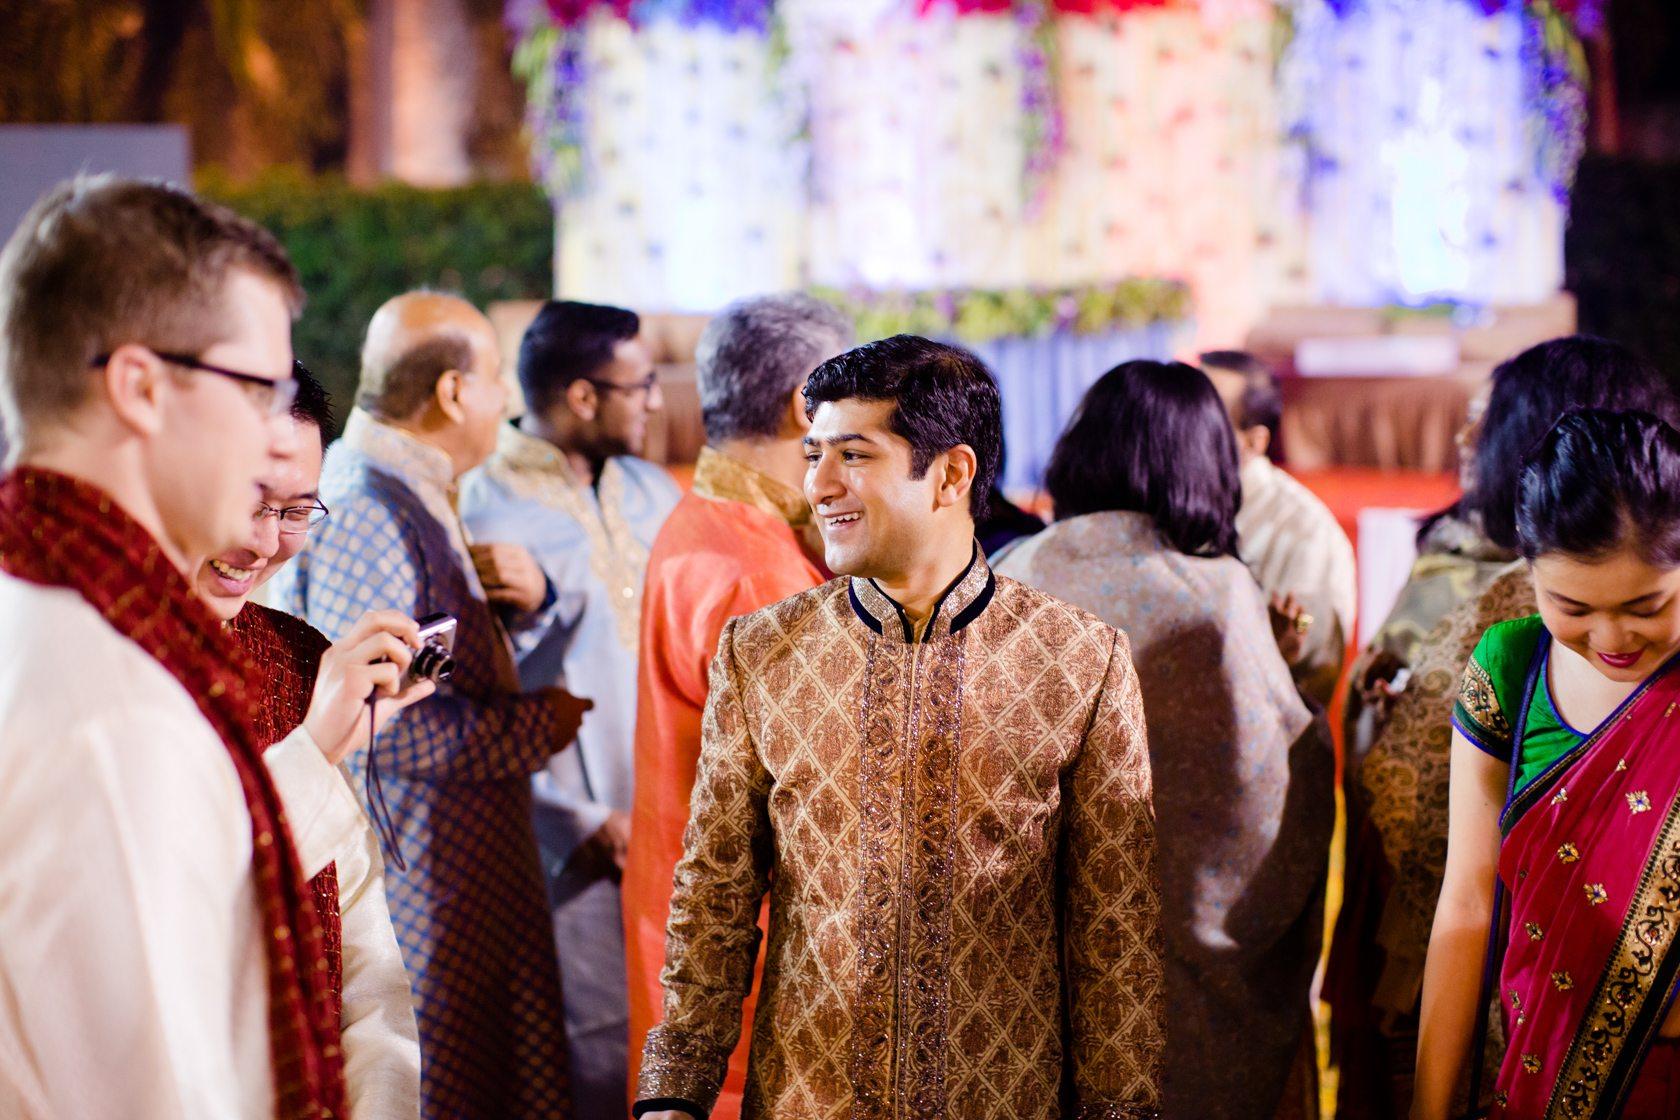 India_Wedding_199.jpg